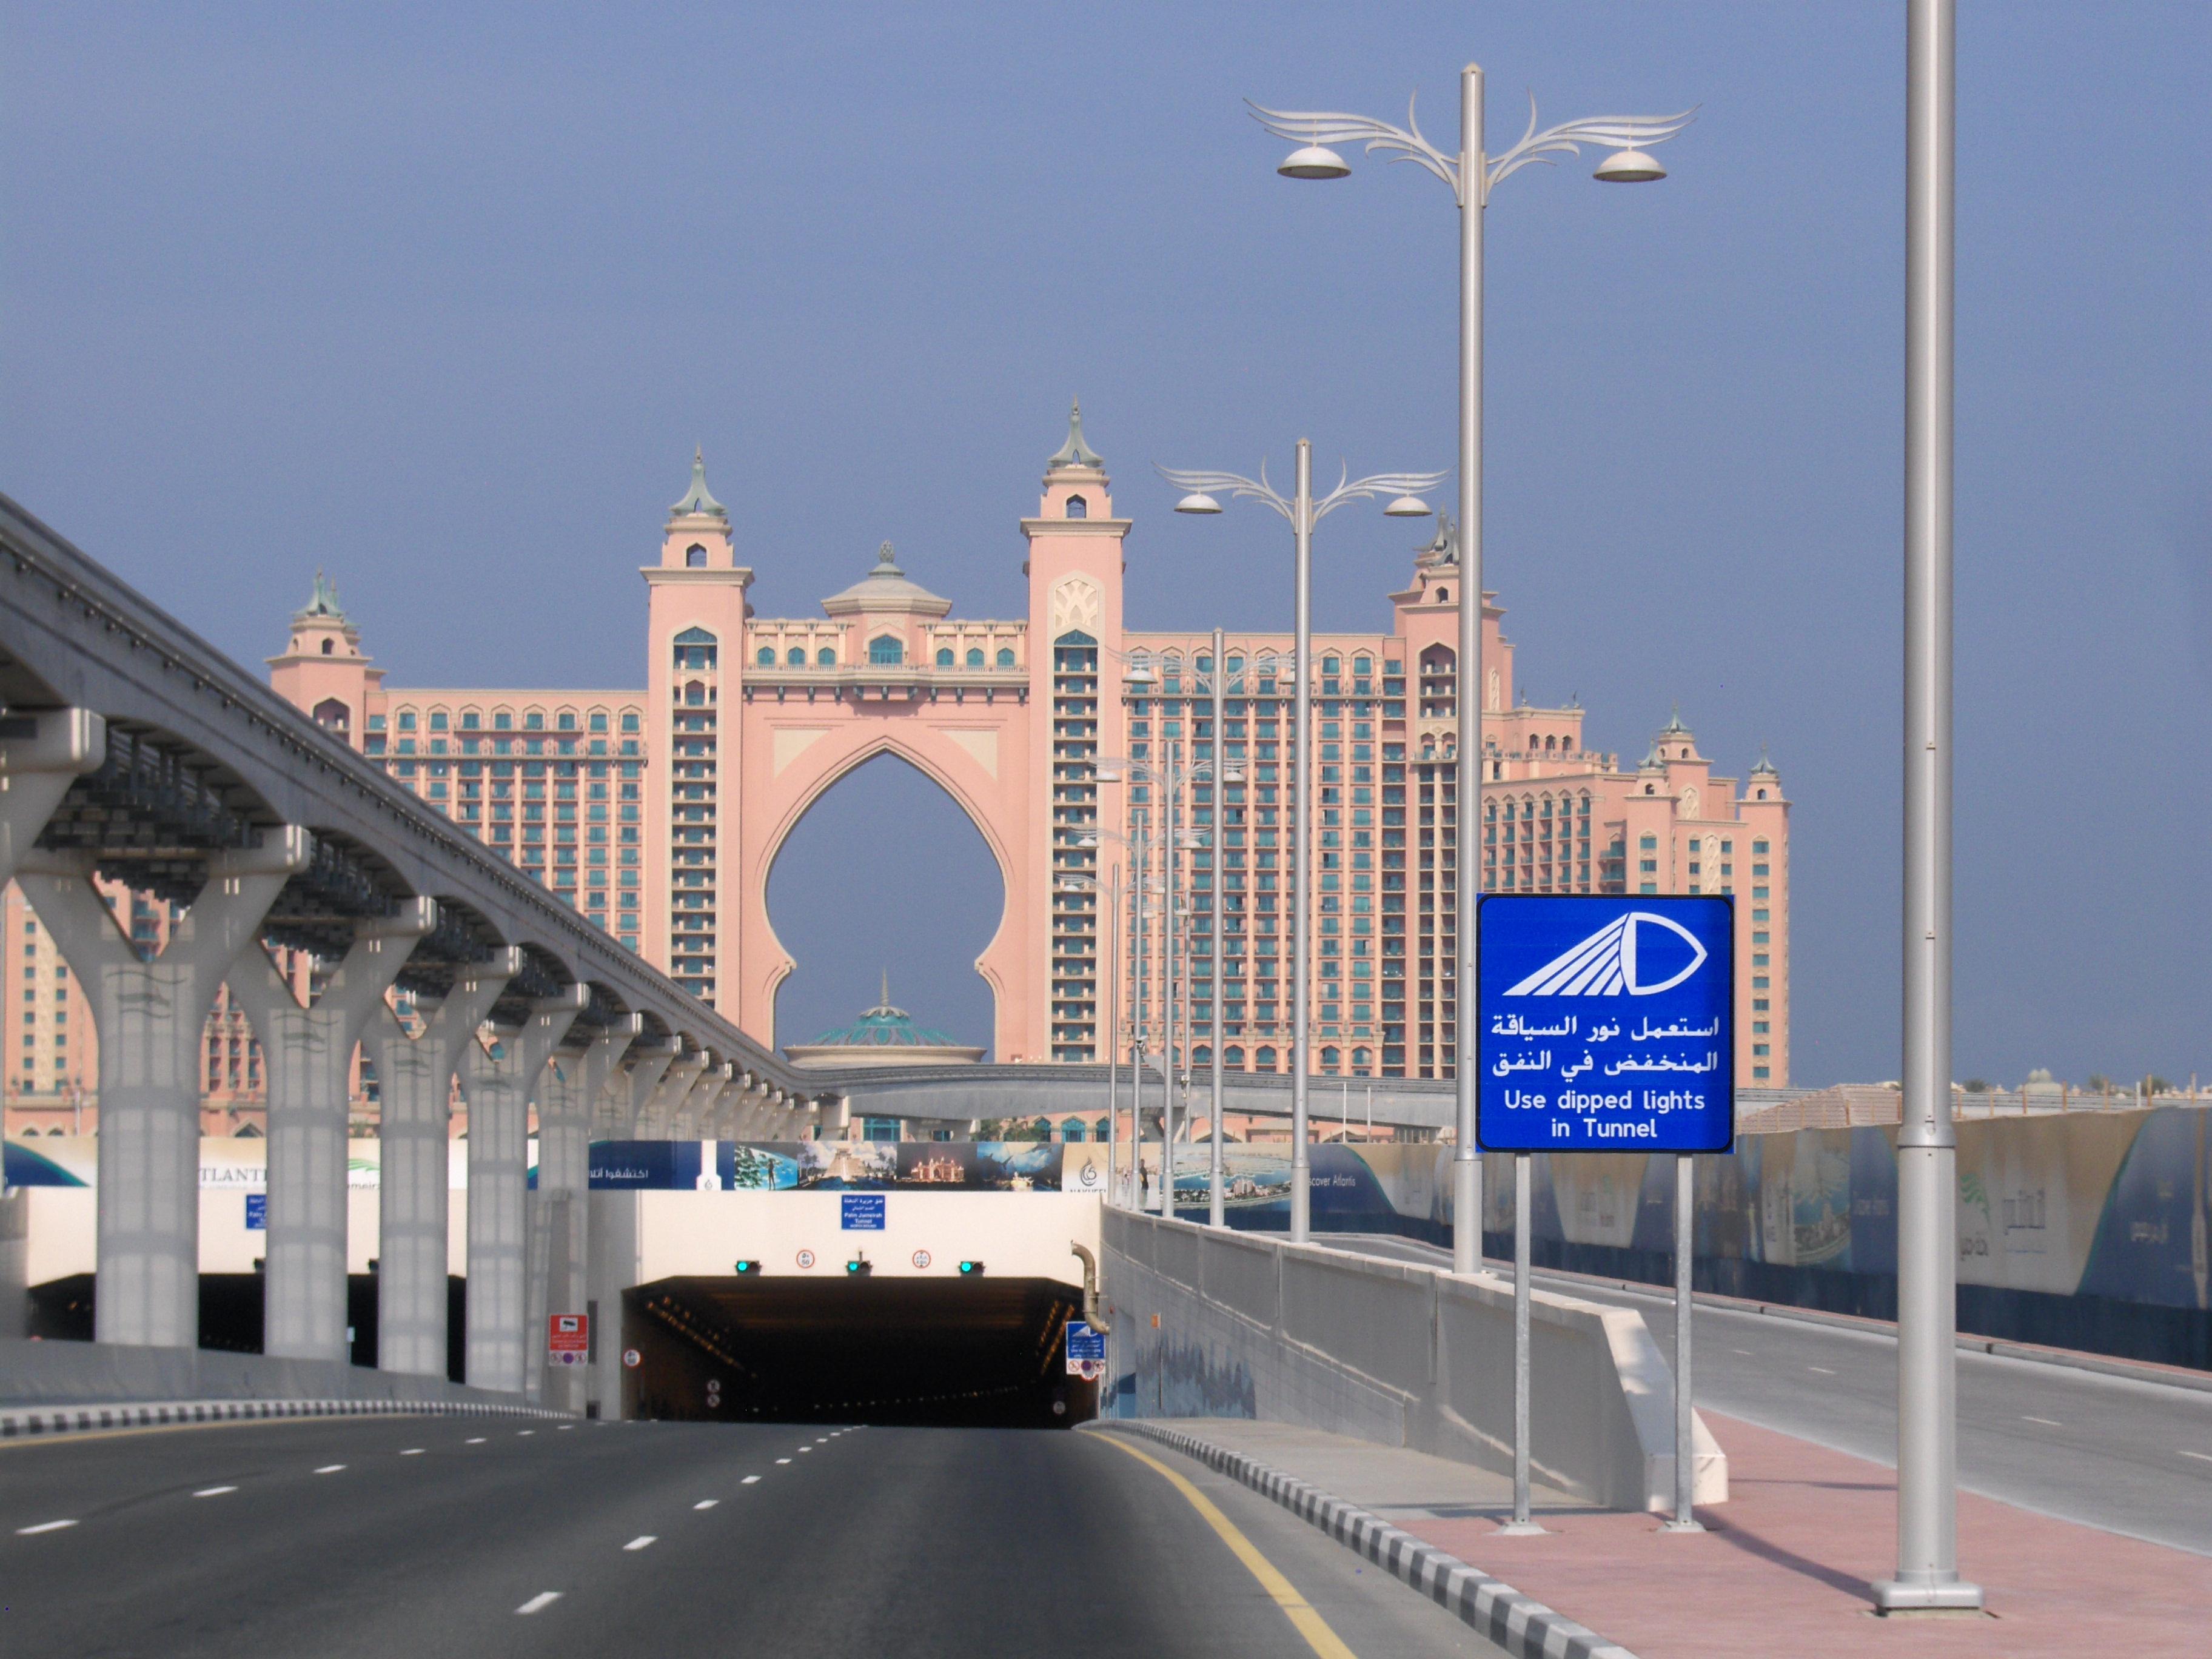 entrance to Palm Island hotel Dubai UAE